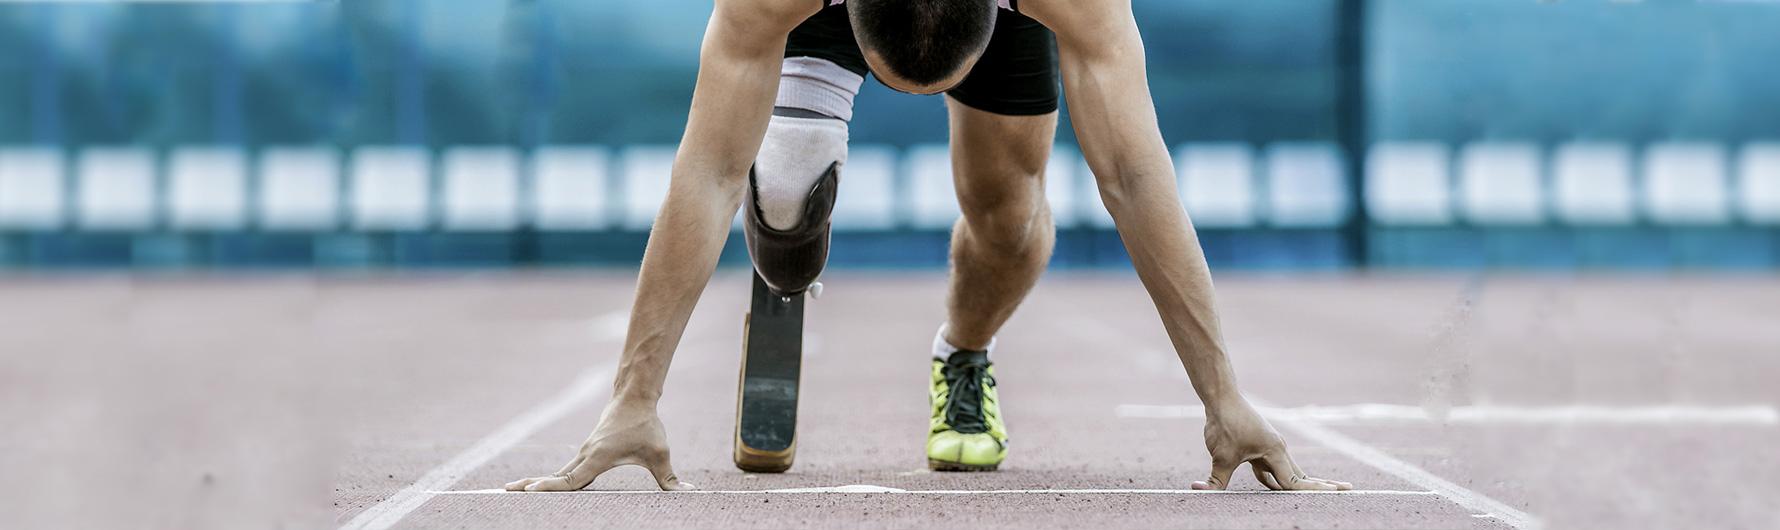 burke-landing_outpatient-physician-practice_prosthetics-orthotics